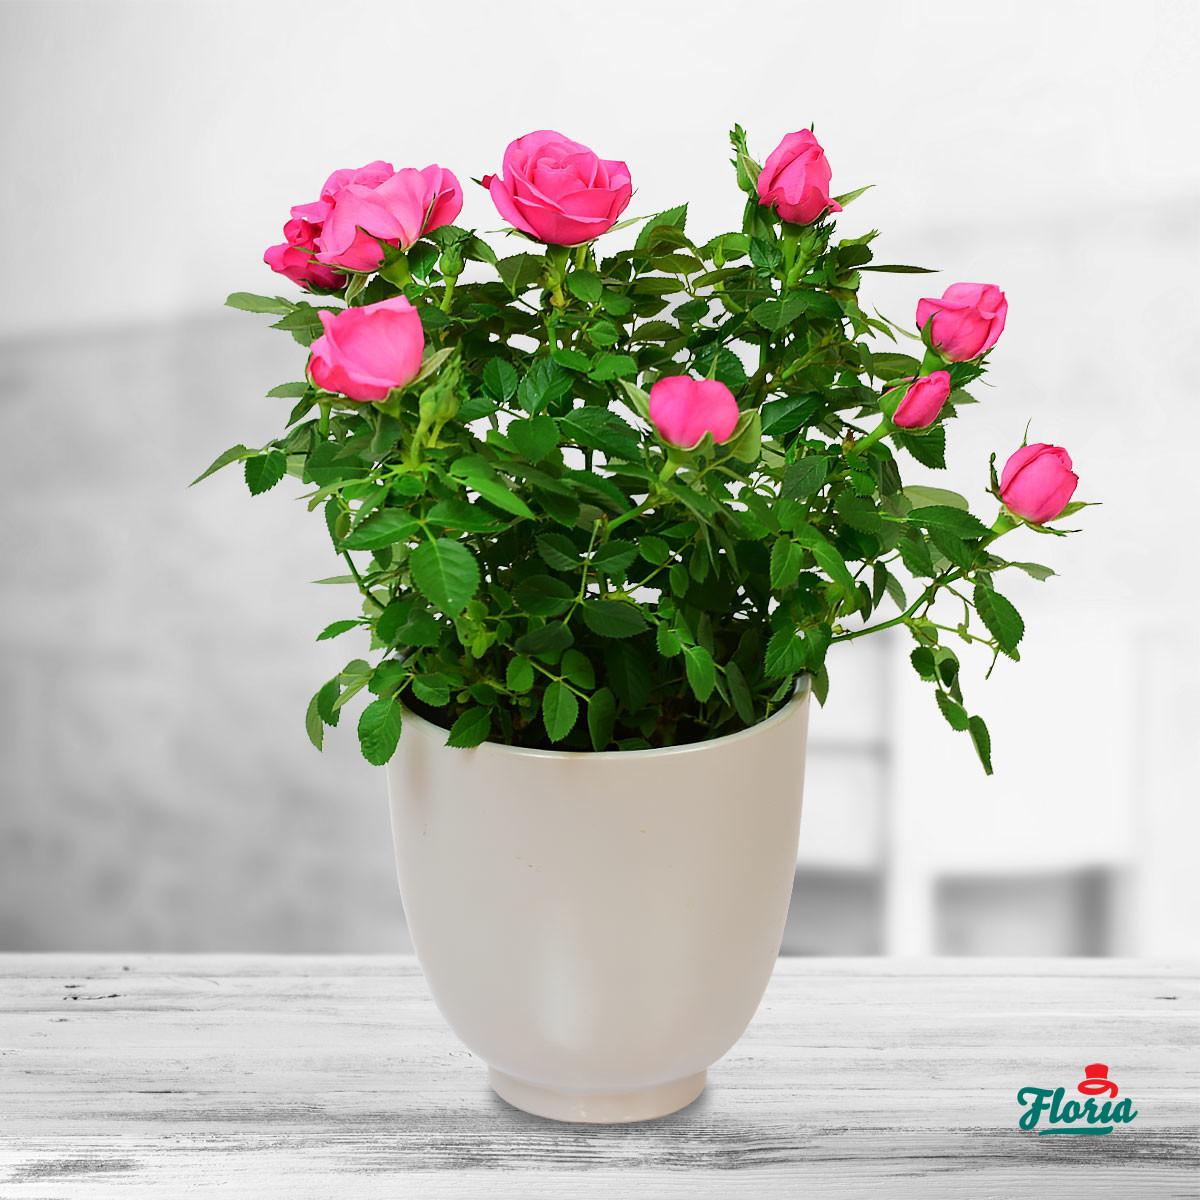 Top 4 mituri despre ingrijirea plantelor de apartament